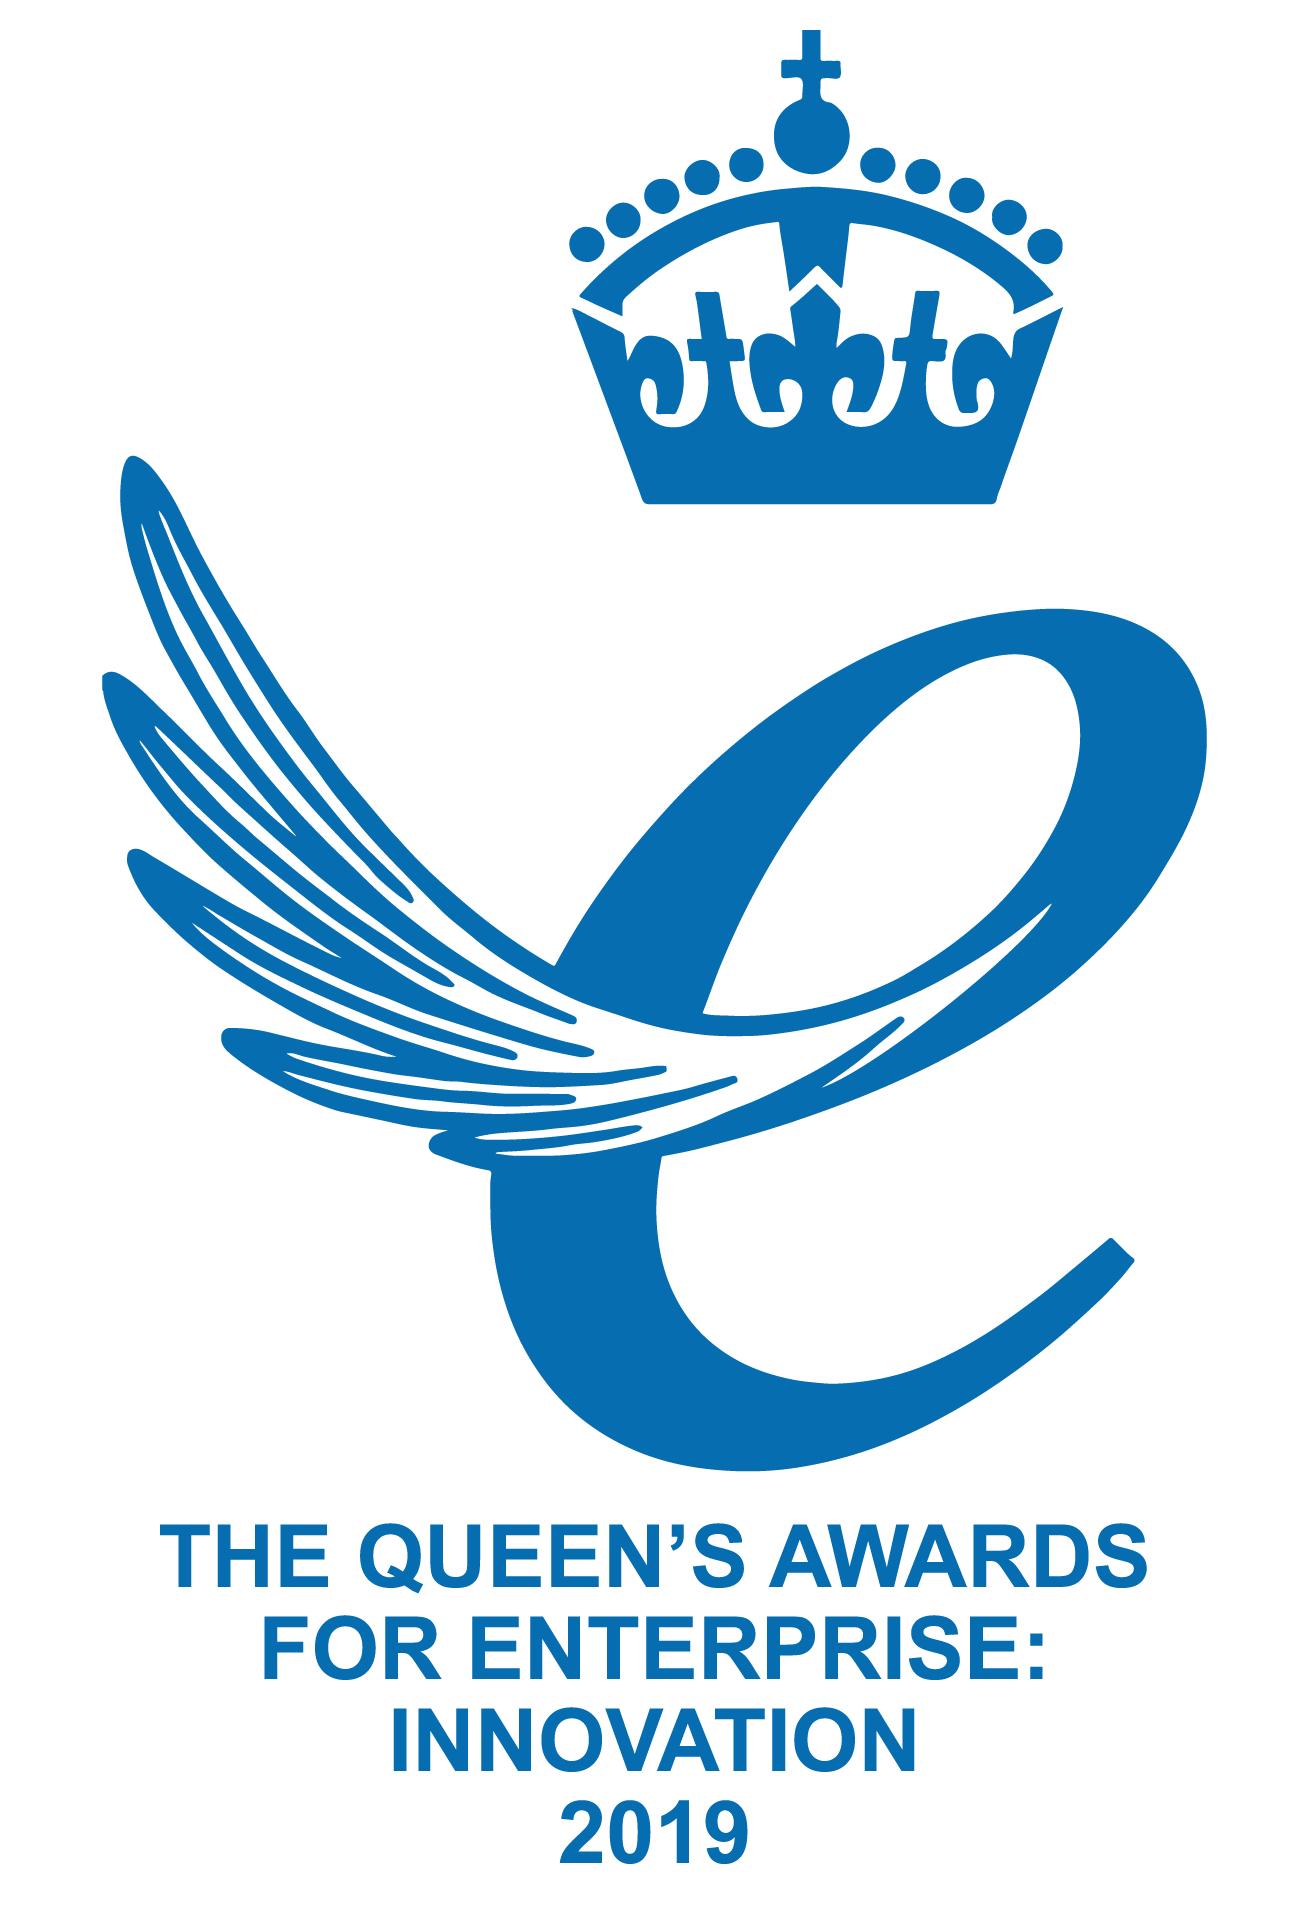 The Queen's Awards for Enterprise Innovation 2019